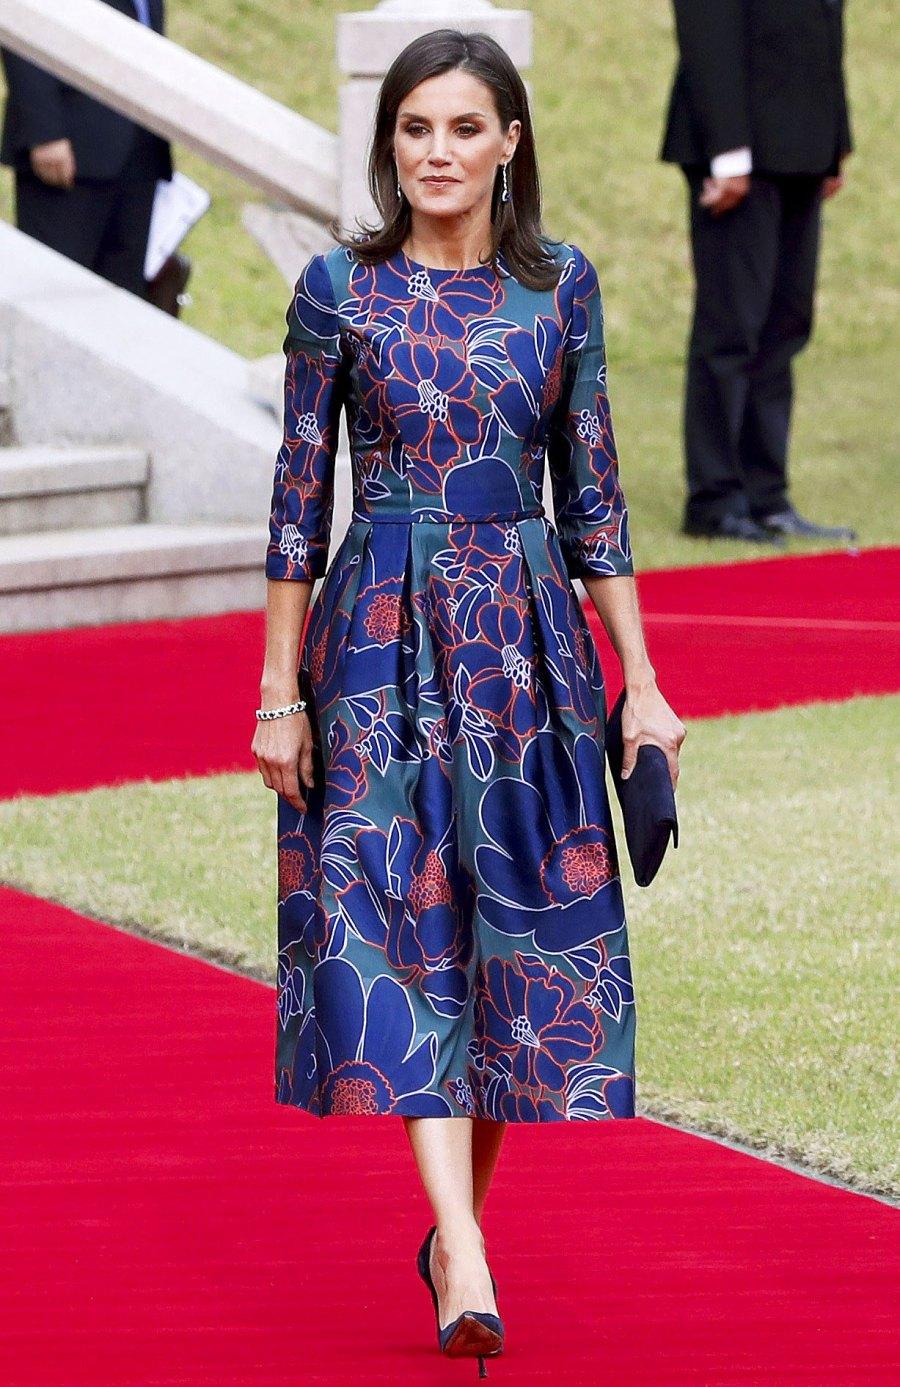 Queen Letizia Floral Dress October 23, 2019